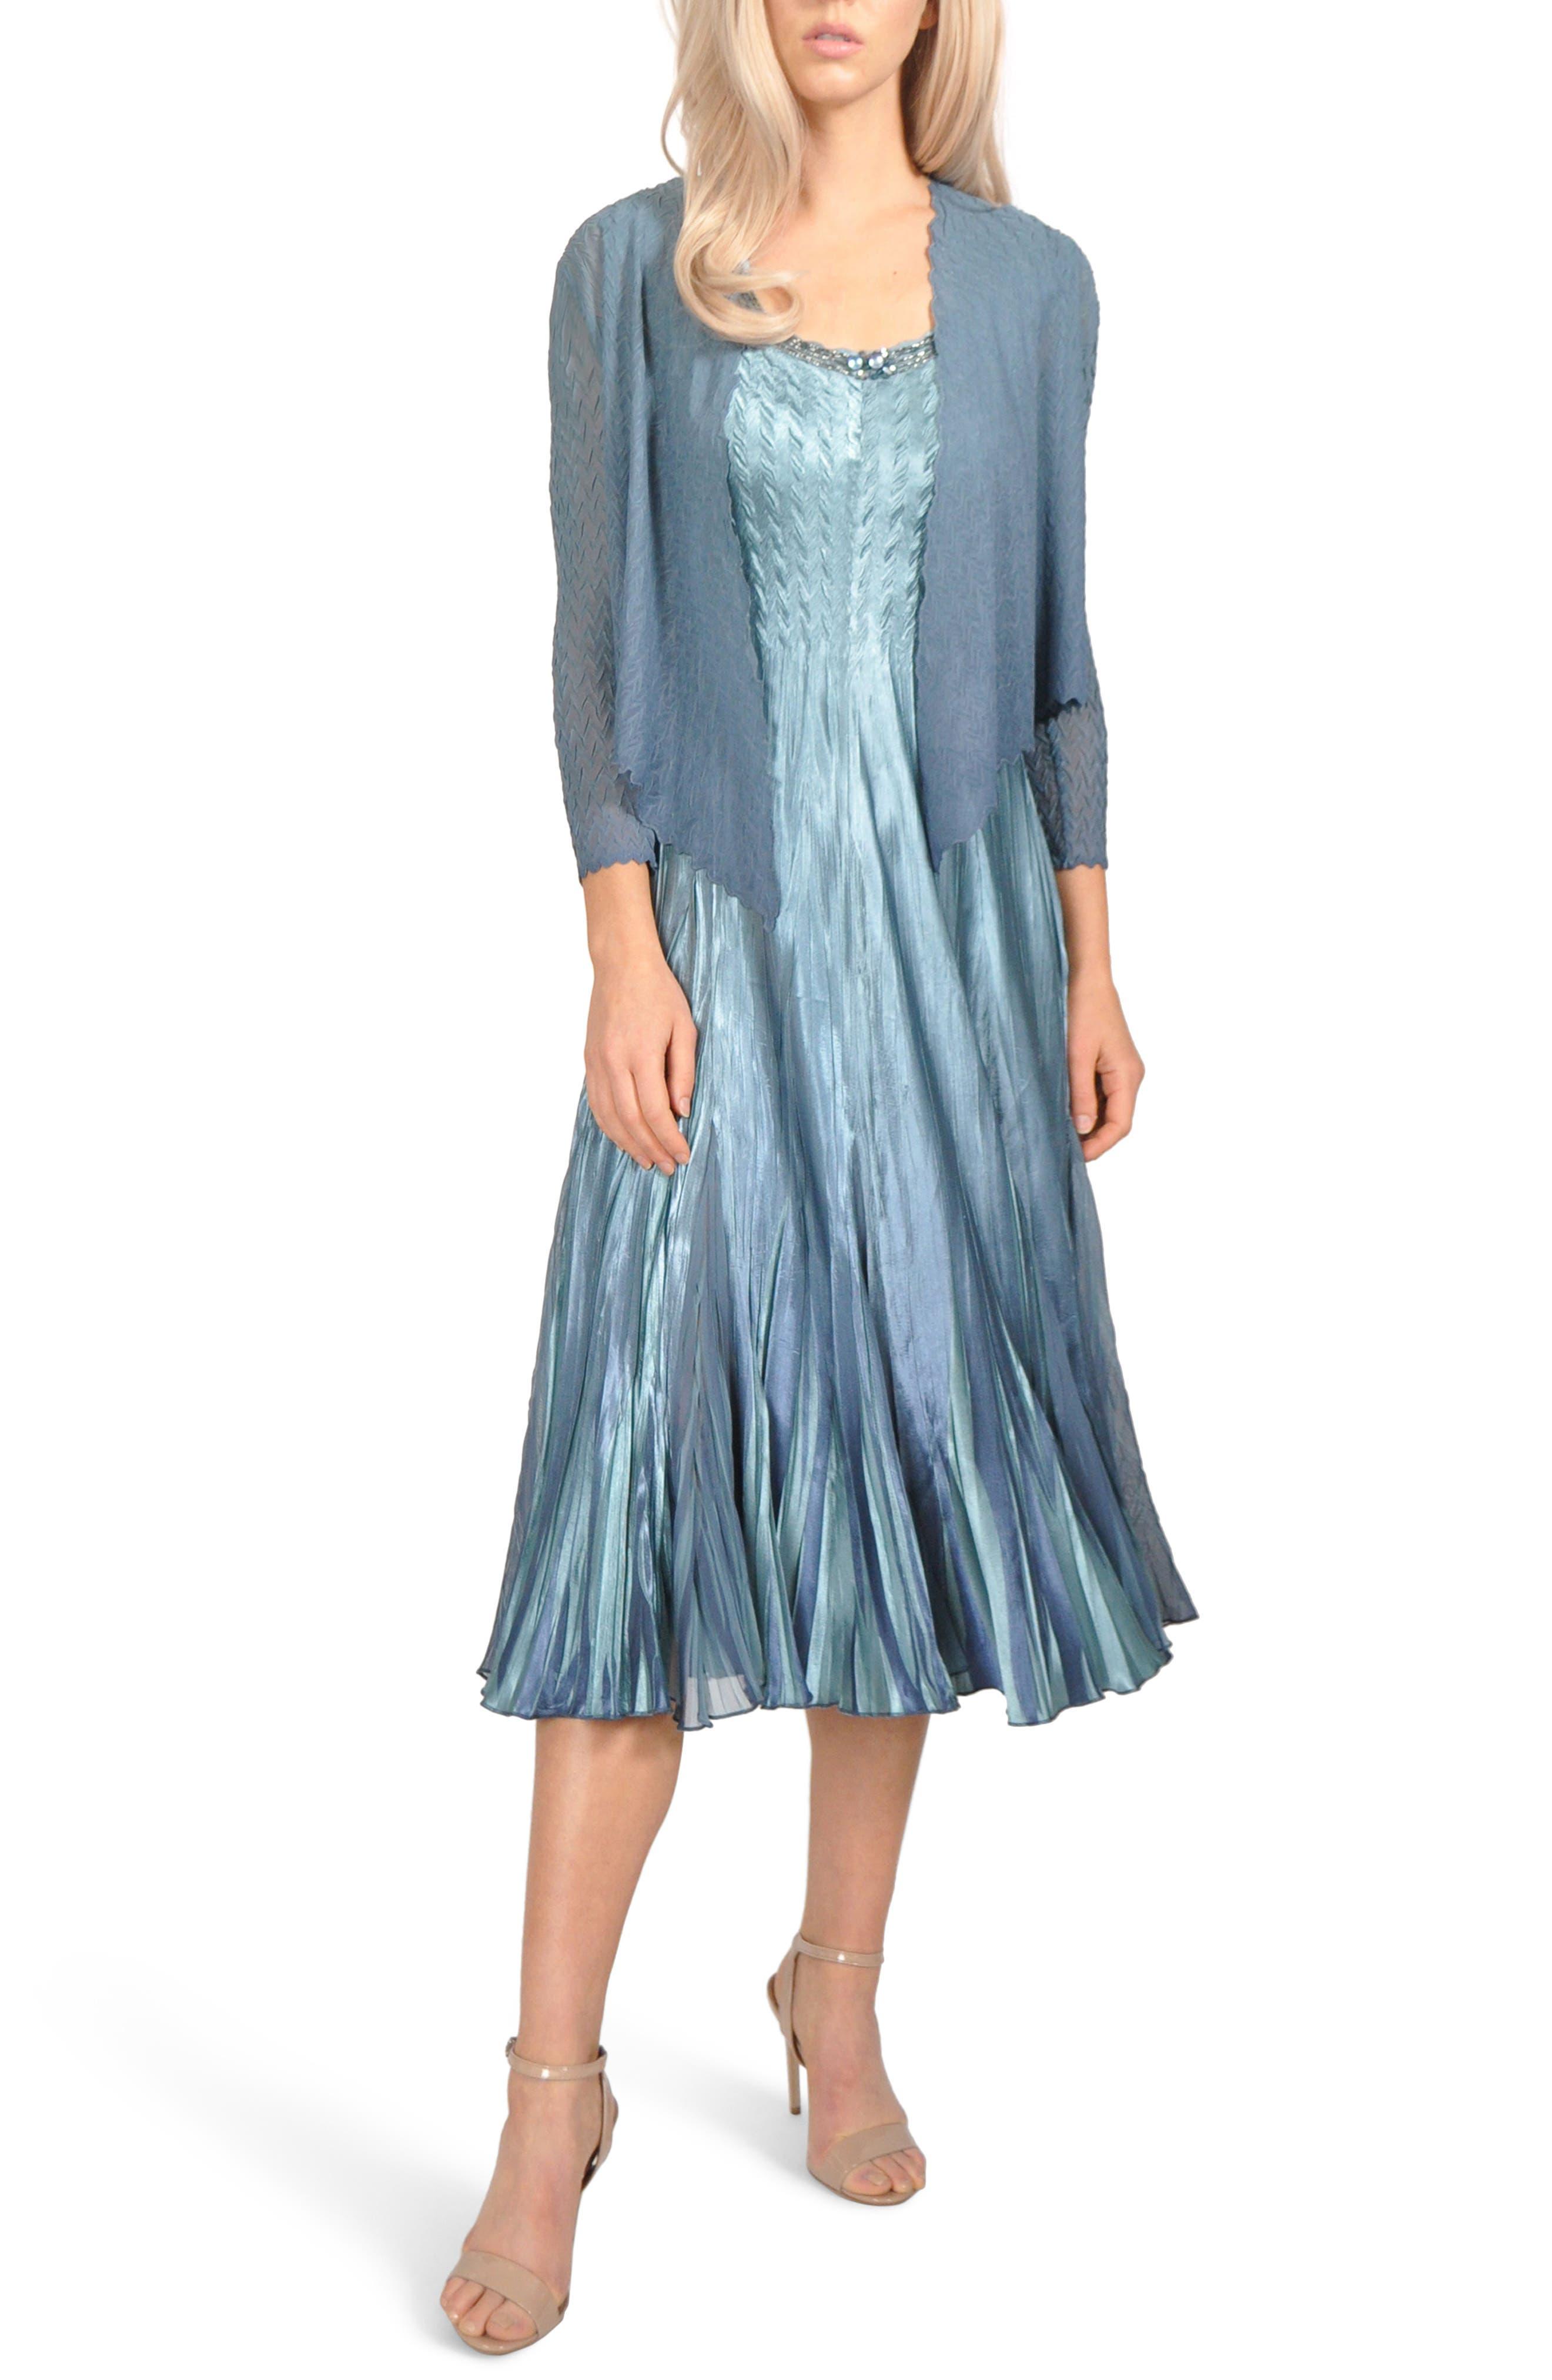 KOMAROV, Embellished Pleat Mixed Media Dress with Jacket, Main thumbnail 1, color, 405